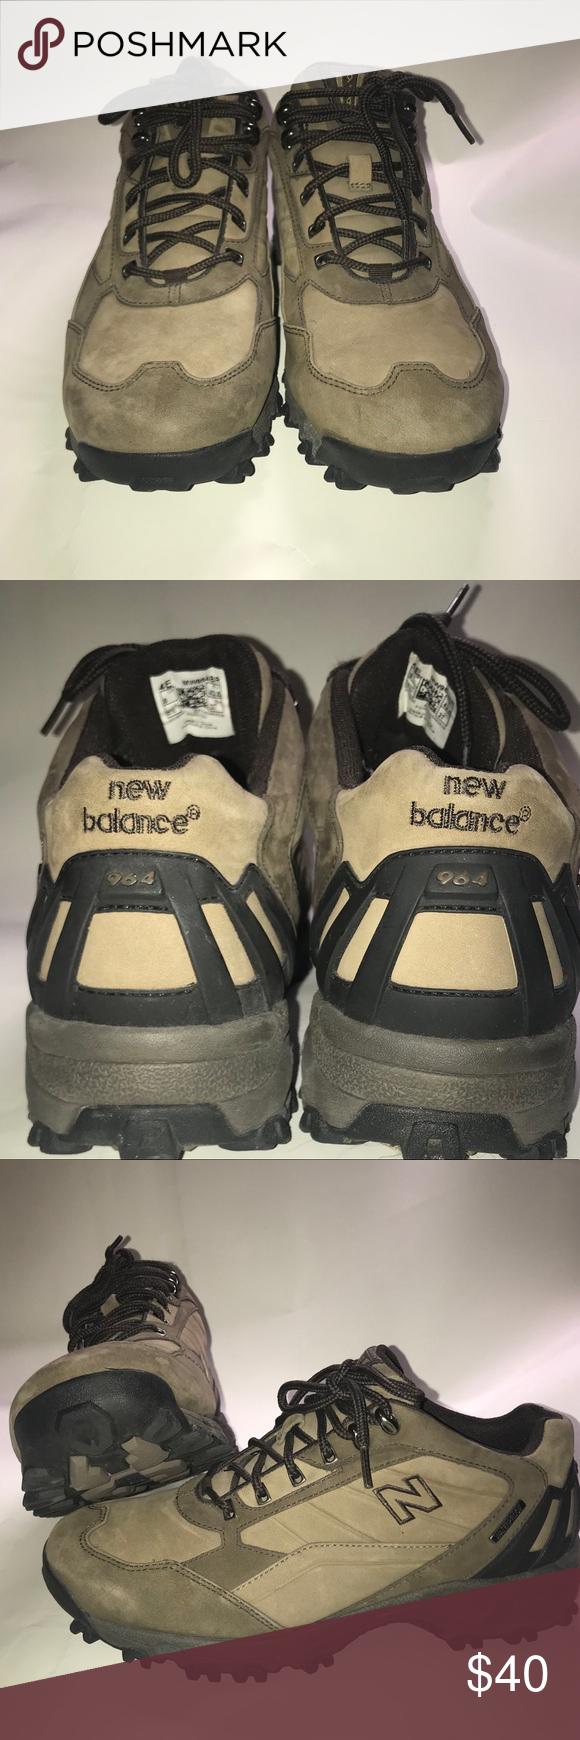 New balance 964   Hiking boots, New balance, Boots